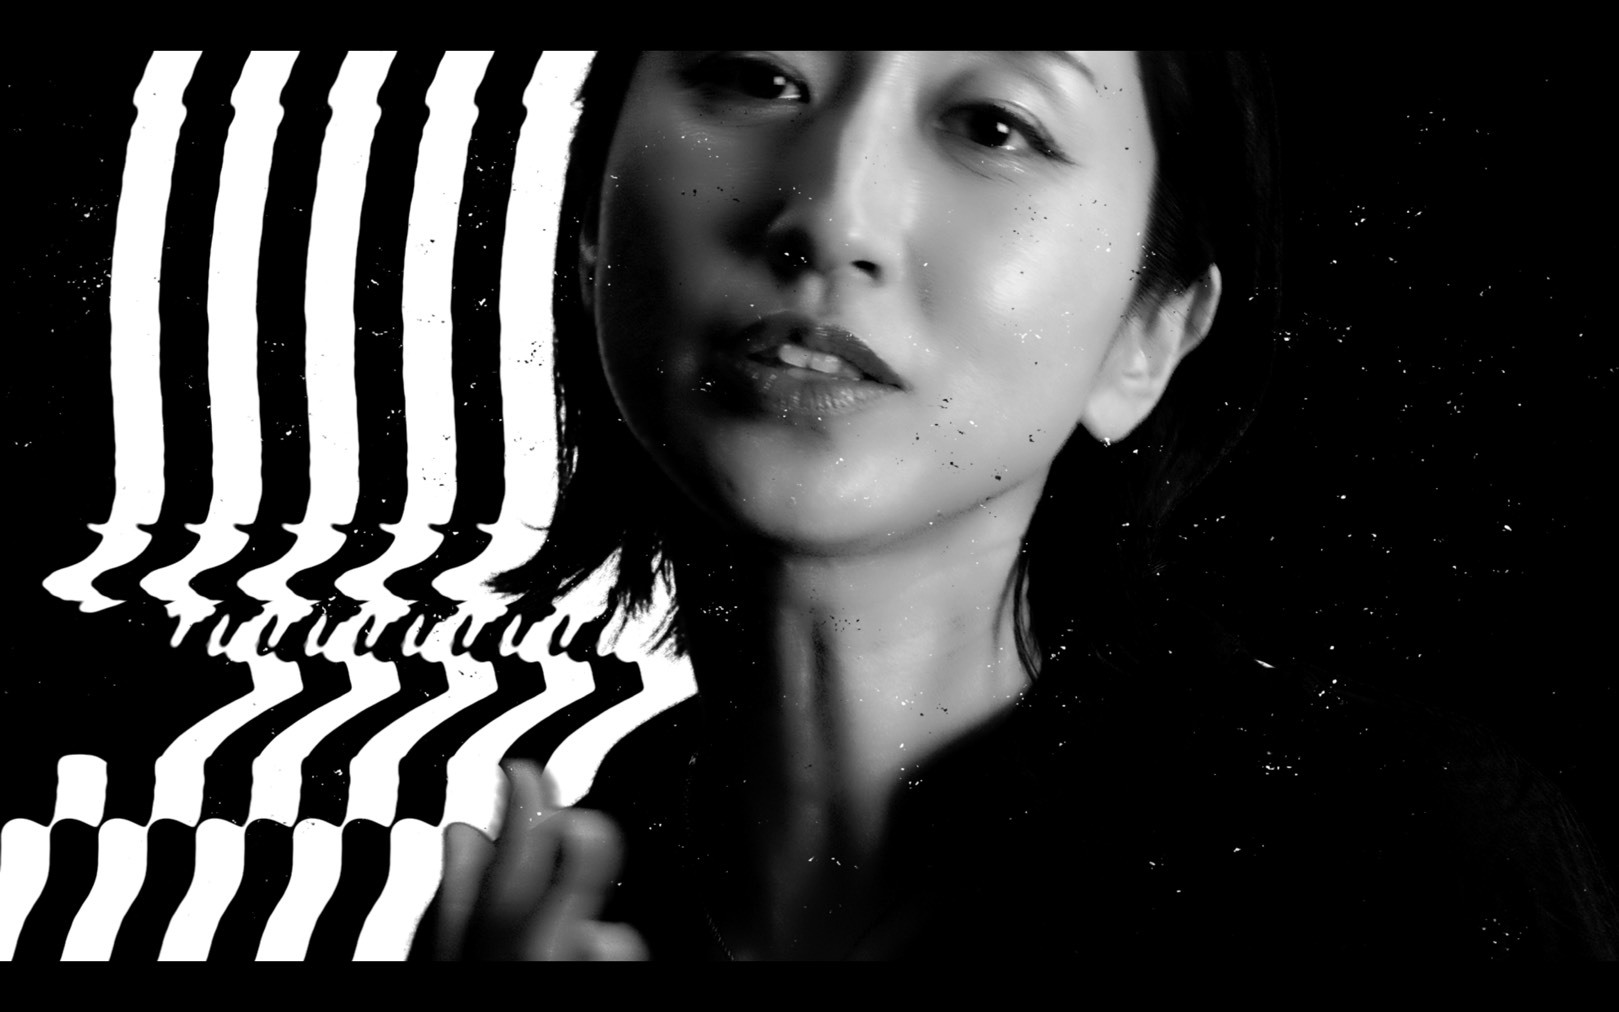 「Cold Kiss」ミュージックビデオより